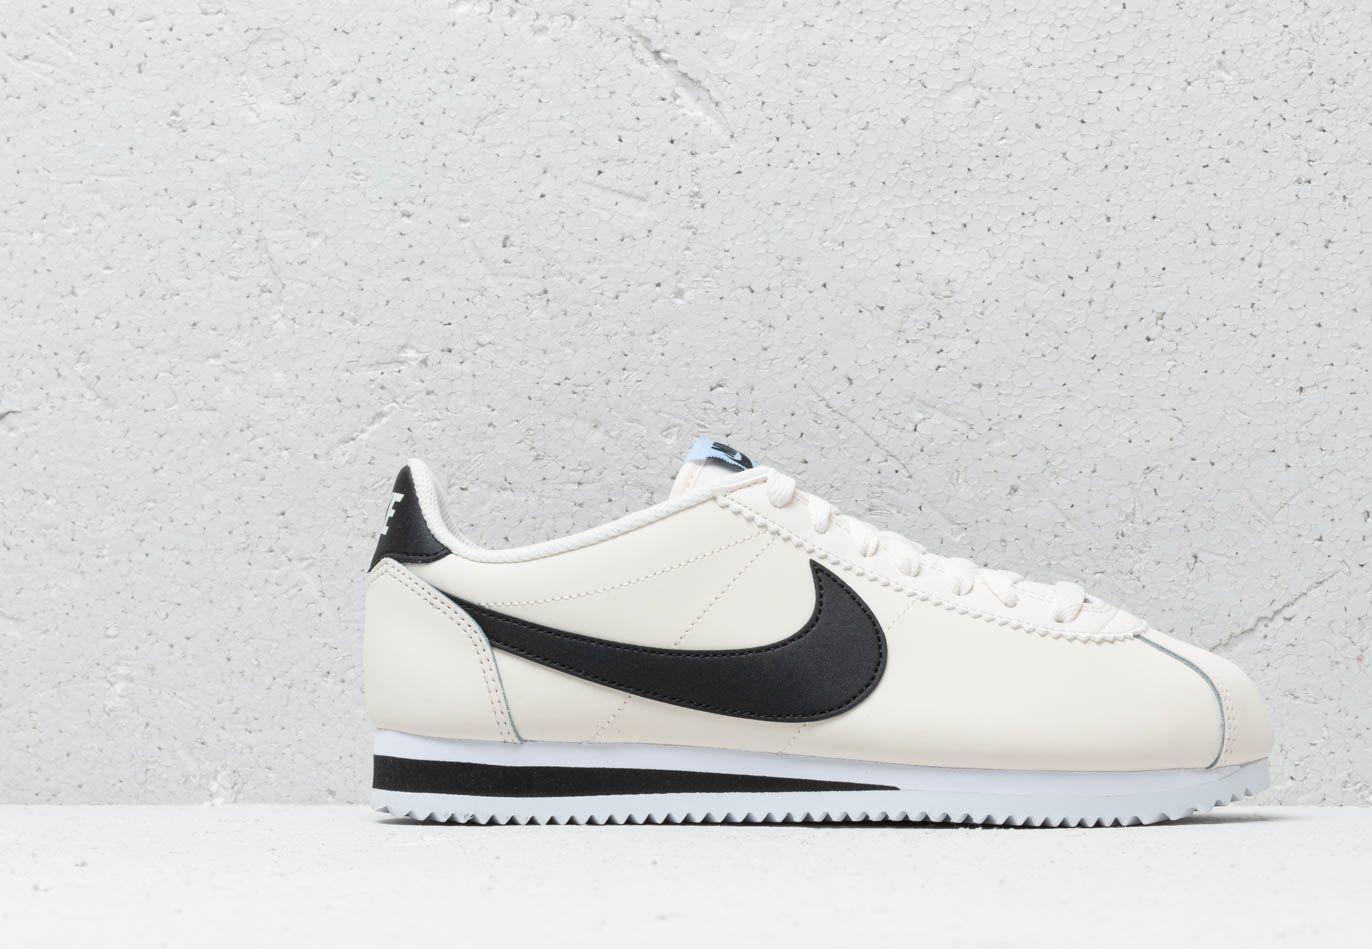 Wmns Ivory Cortez Aluminum White Leather Nike Classic Black DY9I2WEH